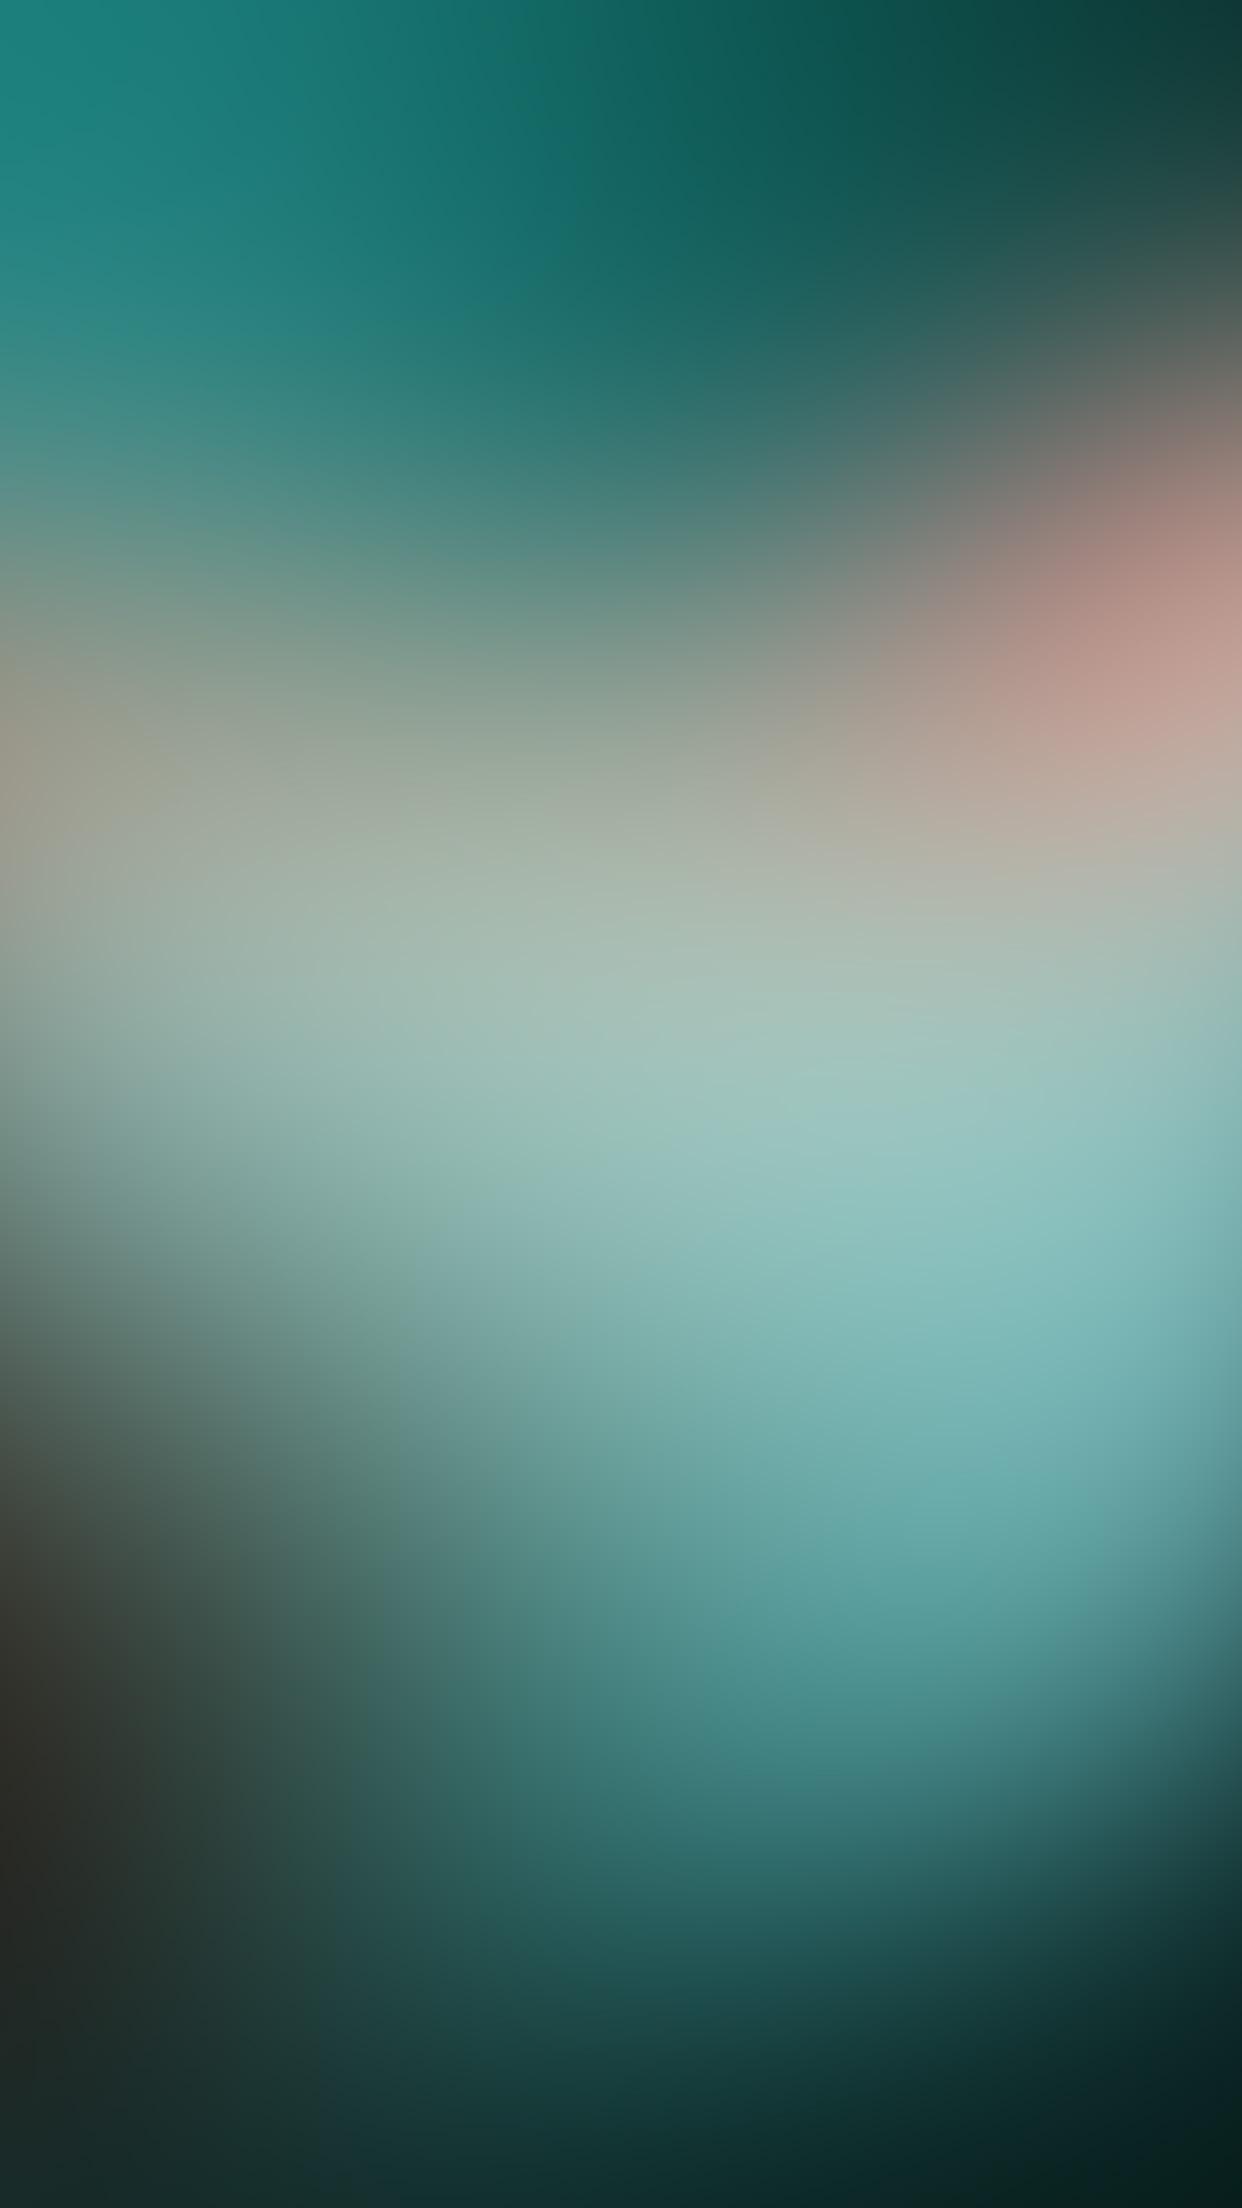 Sn50 Green Night Blur Gradation Wallpaper